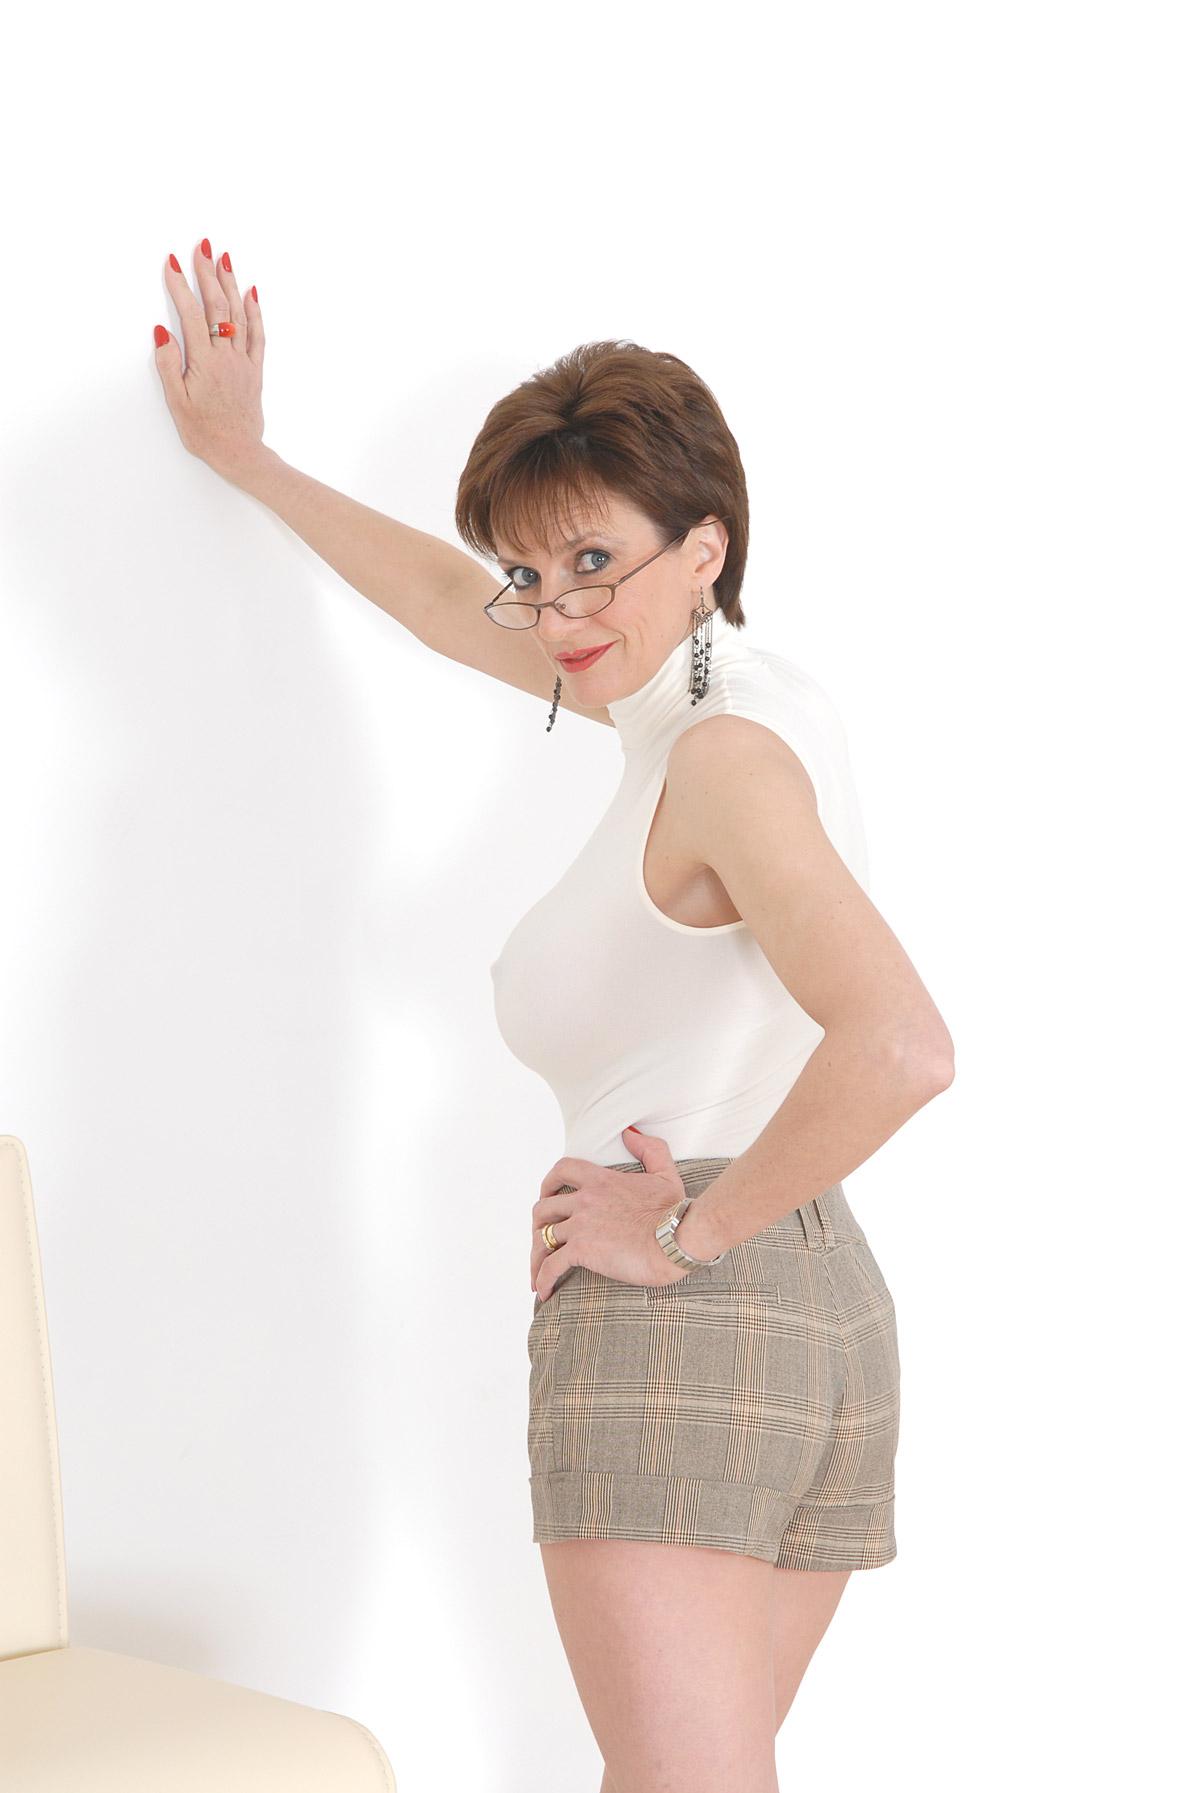 Lady Nice Ass 53